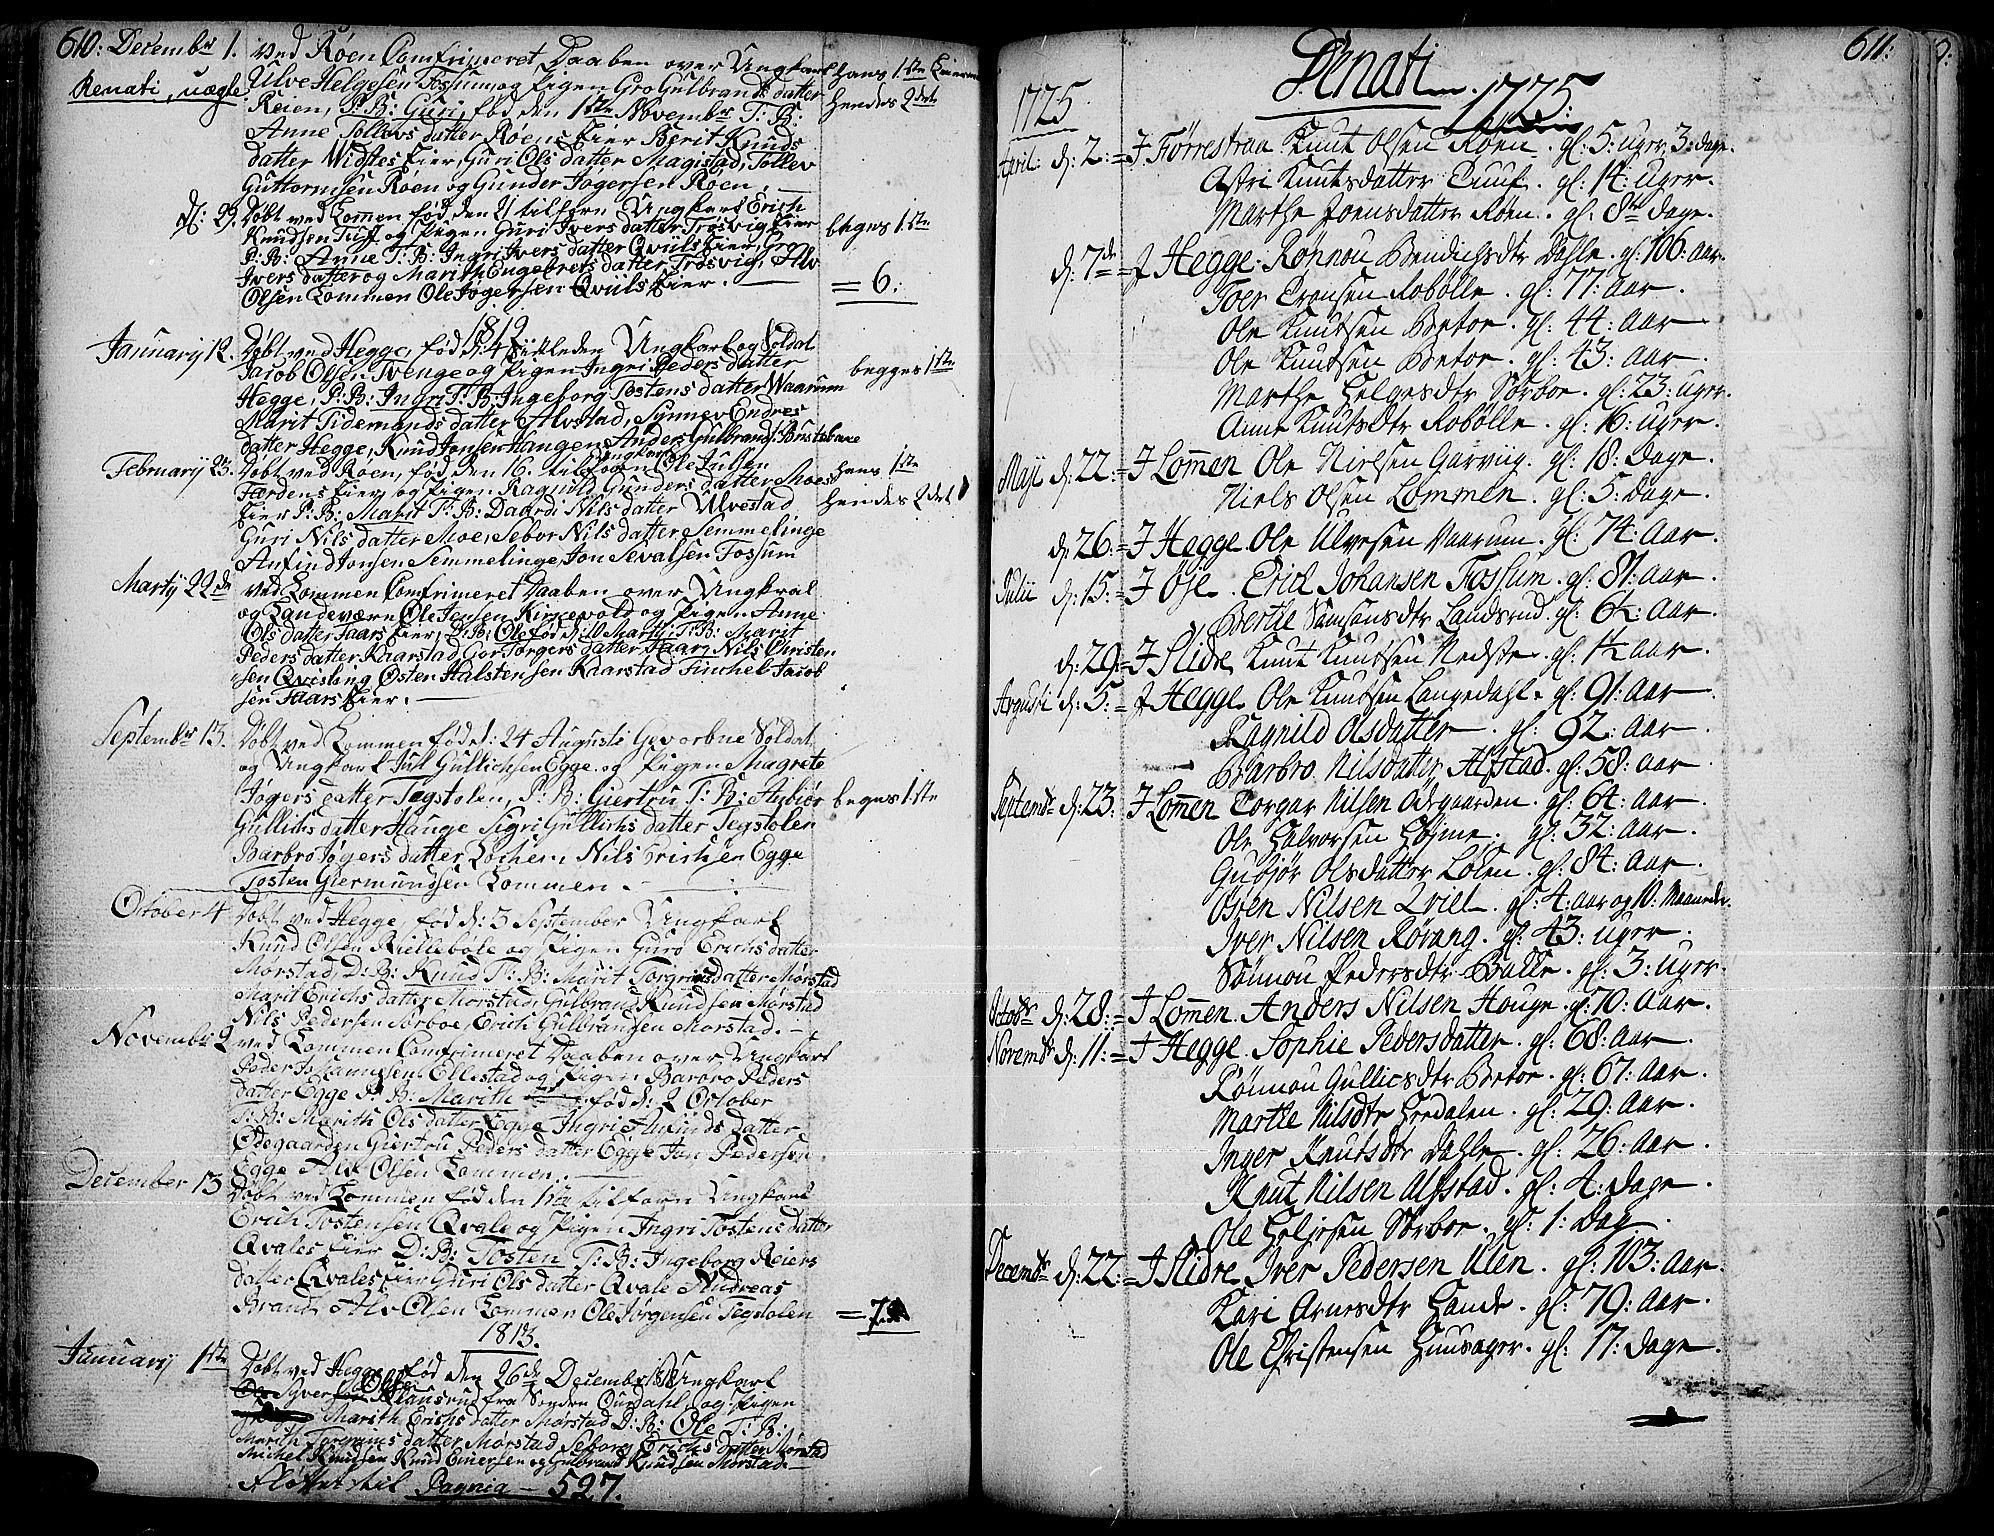 SAH, Slidre prestekontor, Parish register (official) no. 1, 1724-1814, p. 610-611